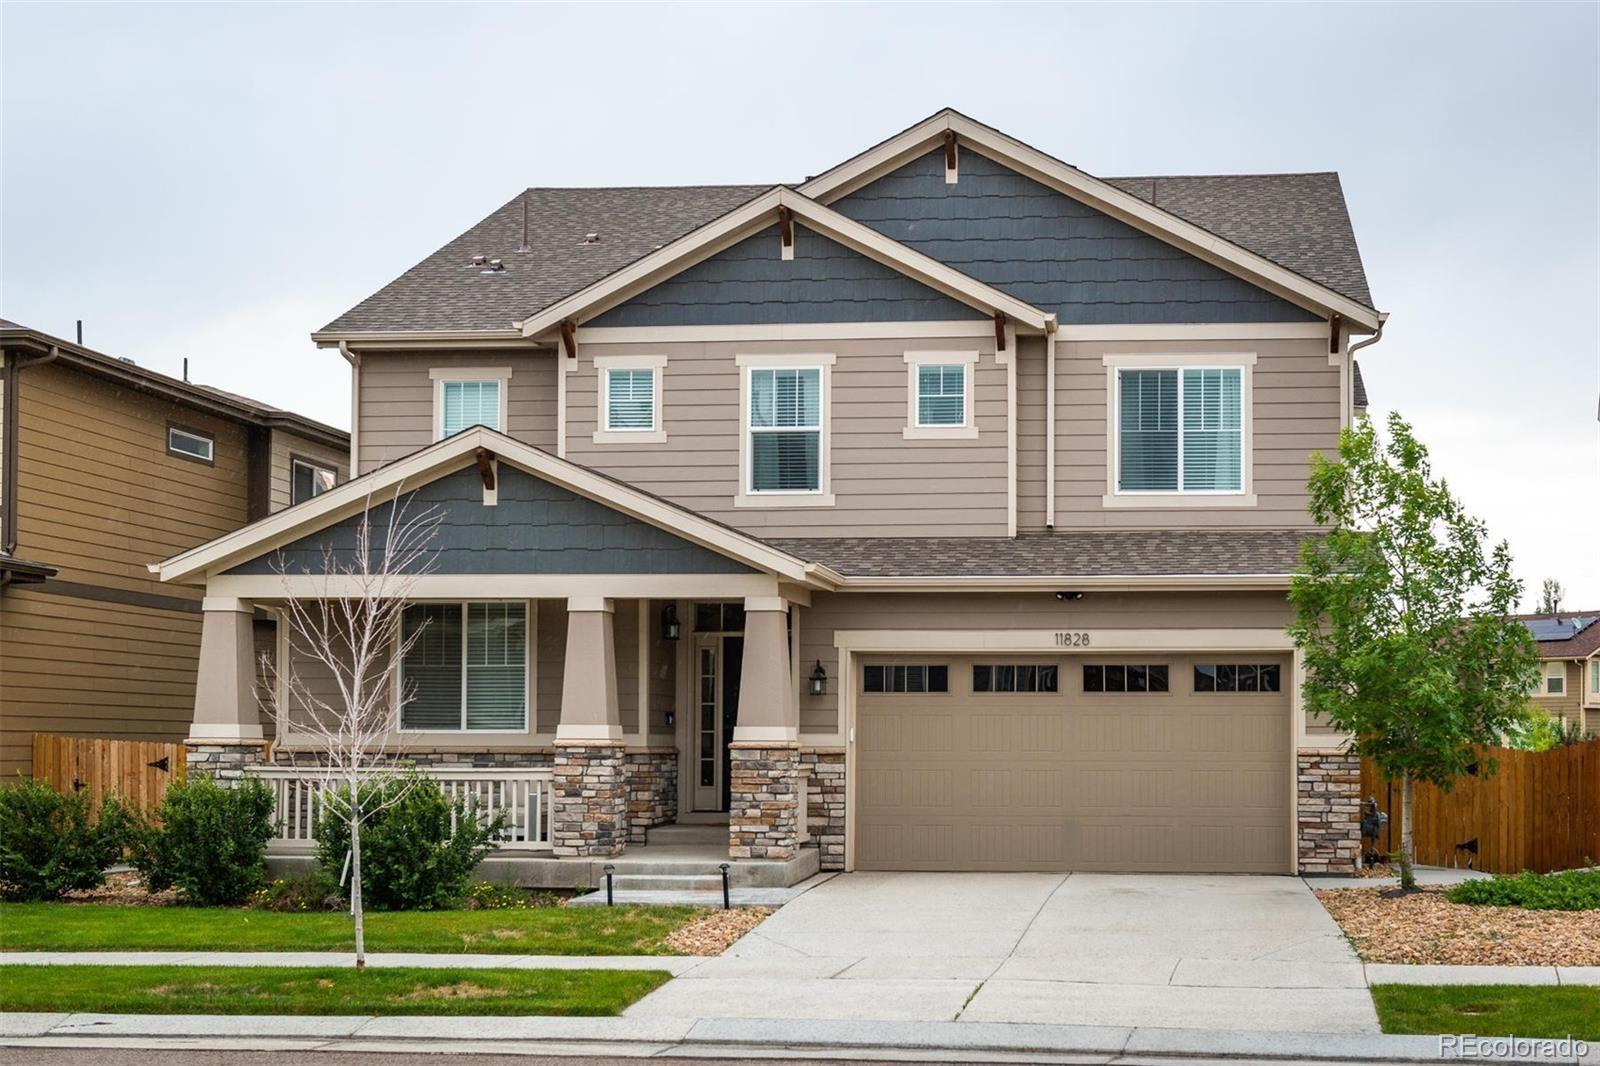 11828 Laredo Street, Commerce City, CO 80022 - #: 5135504